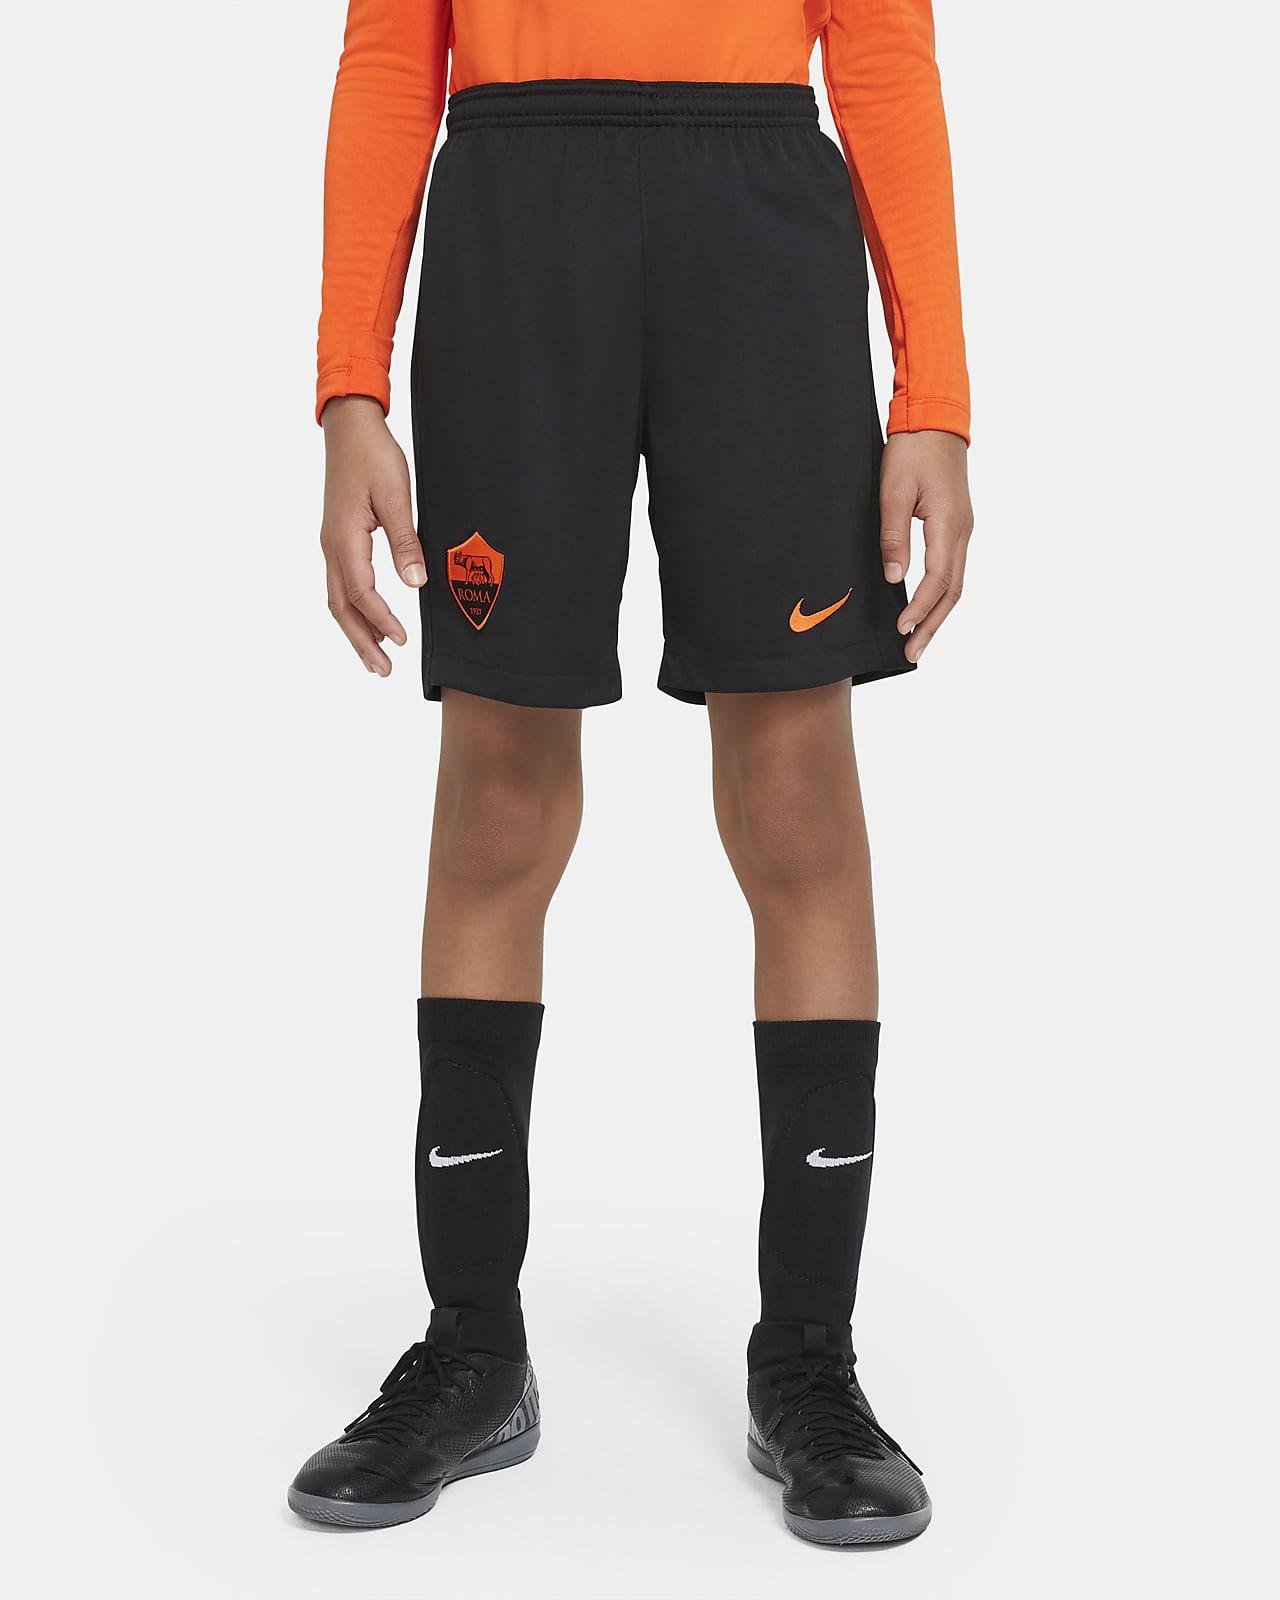 AS Roma 2020/21 Stadium Third Older Kids' Football Shorts